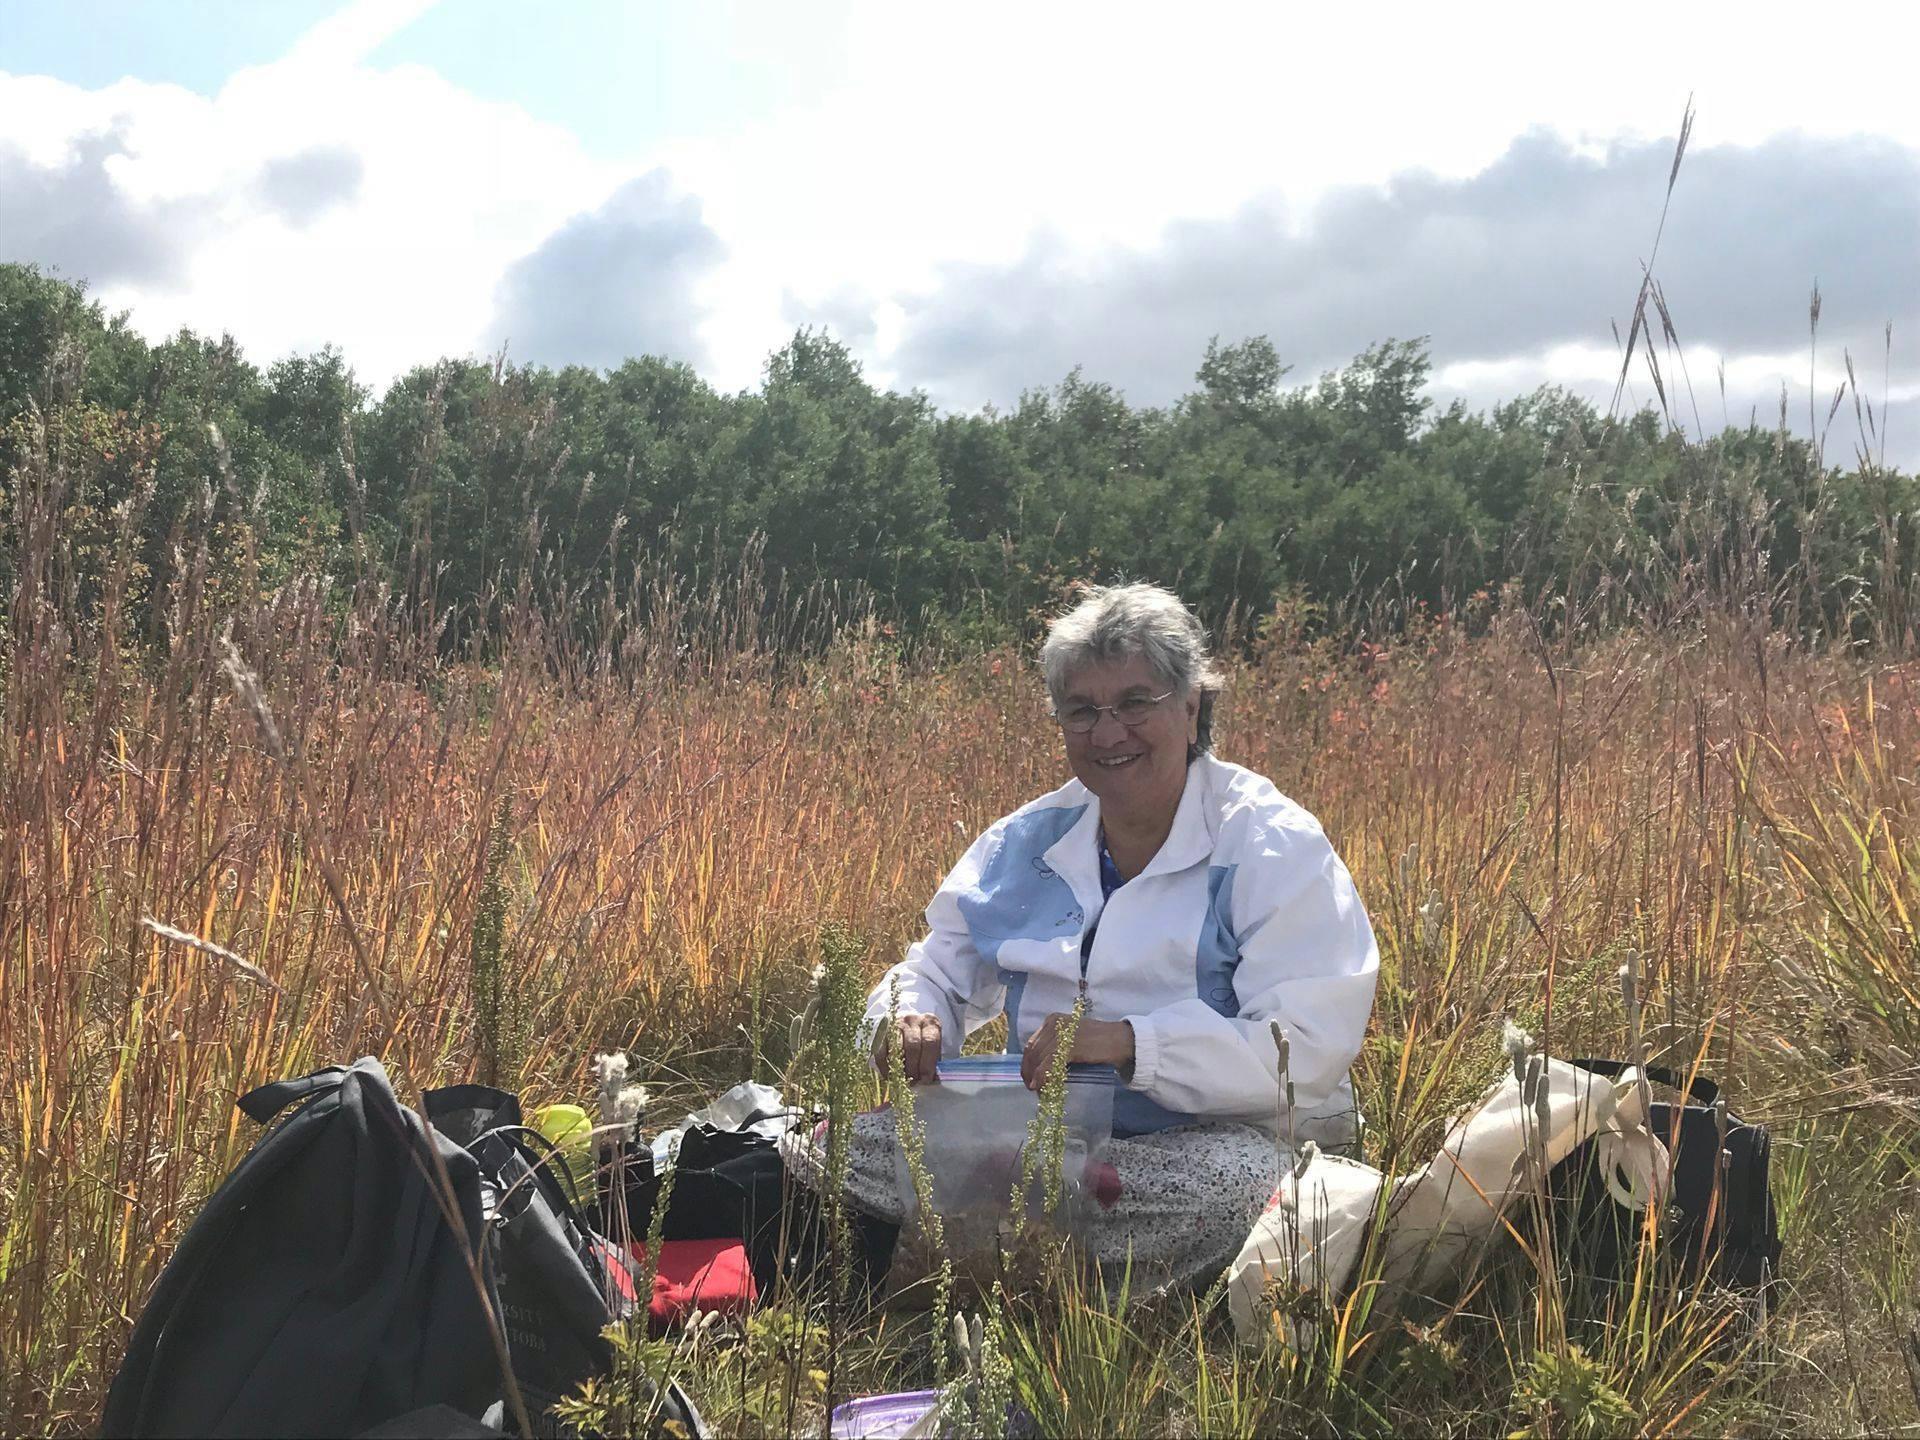 Woman sitting harvesting medicine in field